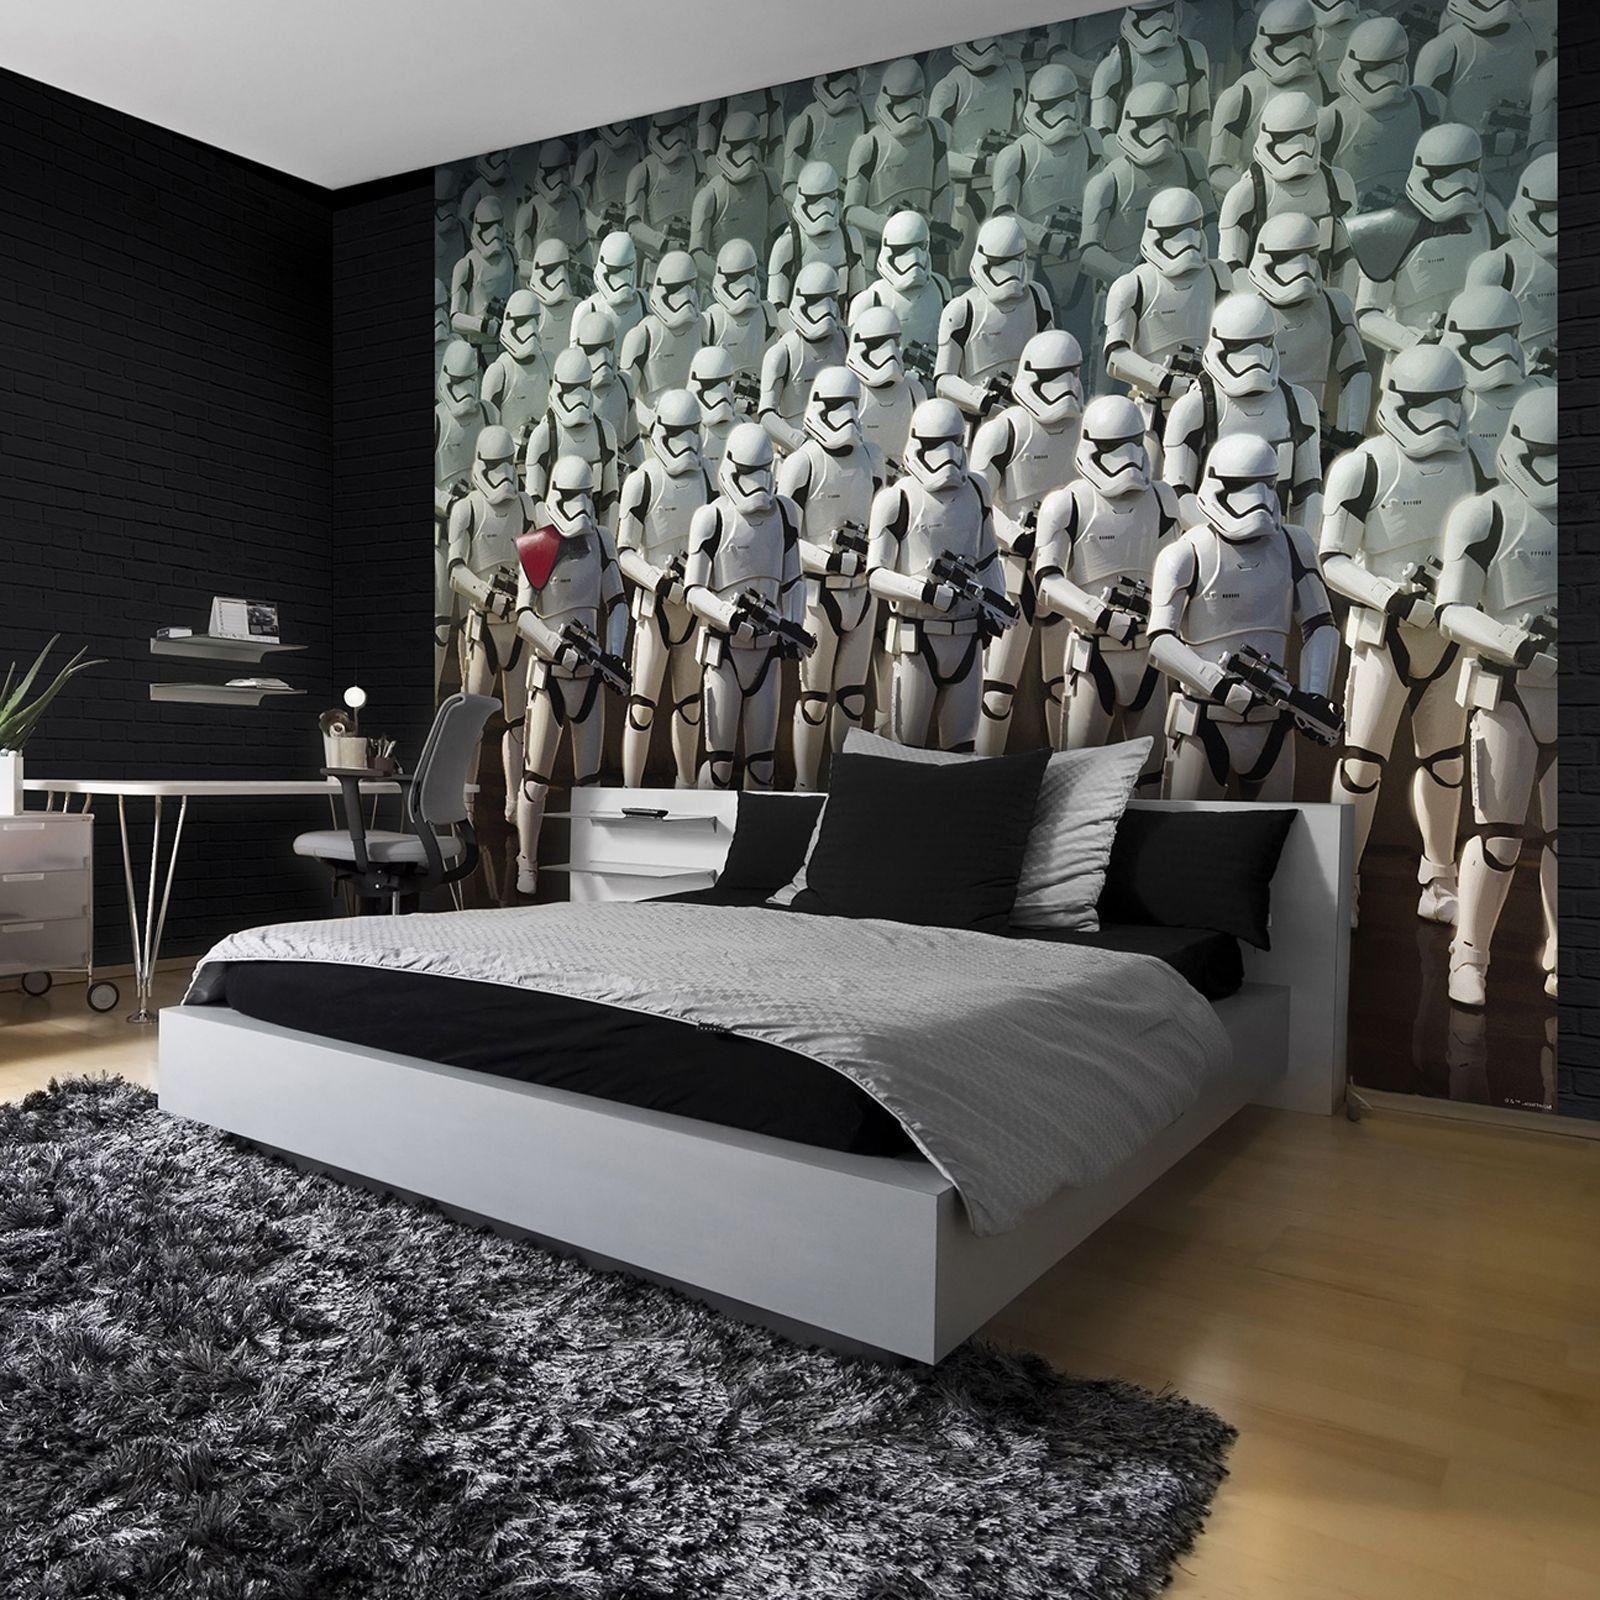 Fresh Lego Star Wars Wallpaper Bedroom In 2020 Star Wars Bedroom Decor Star Wars Bedroom Star Wars Themed Bedroom